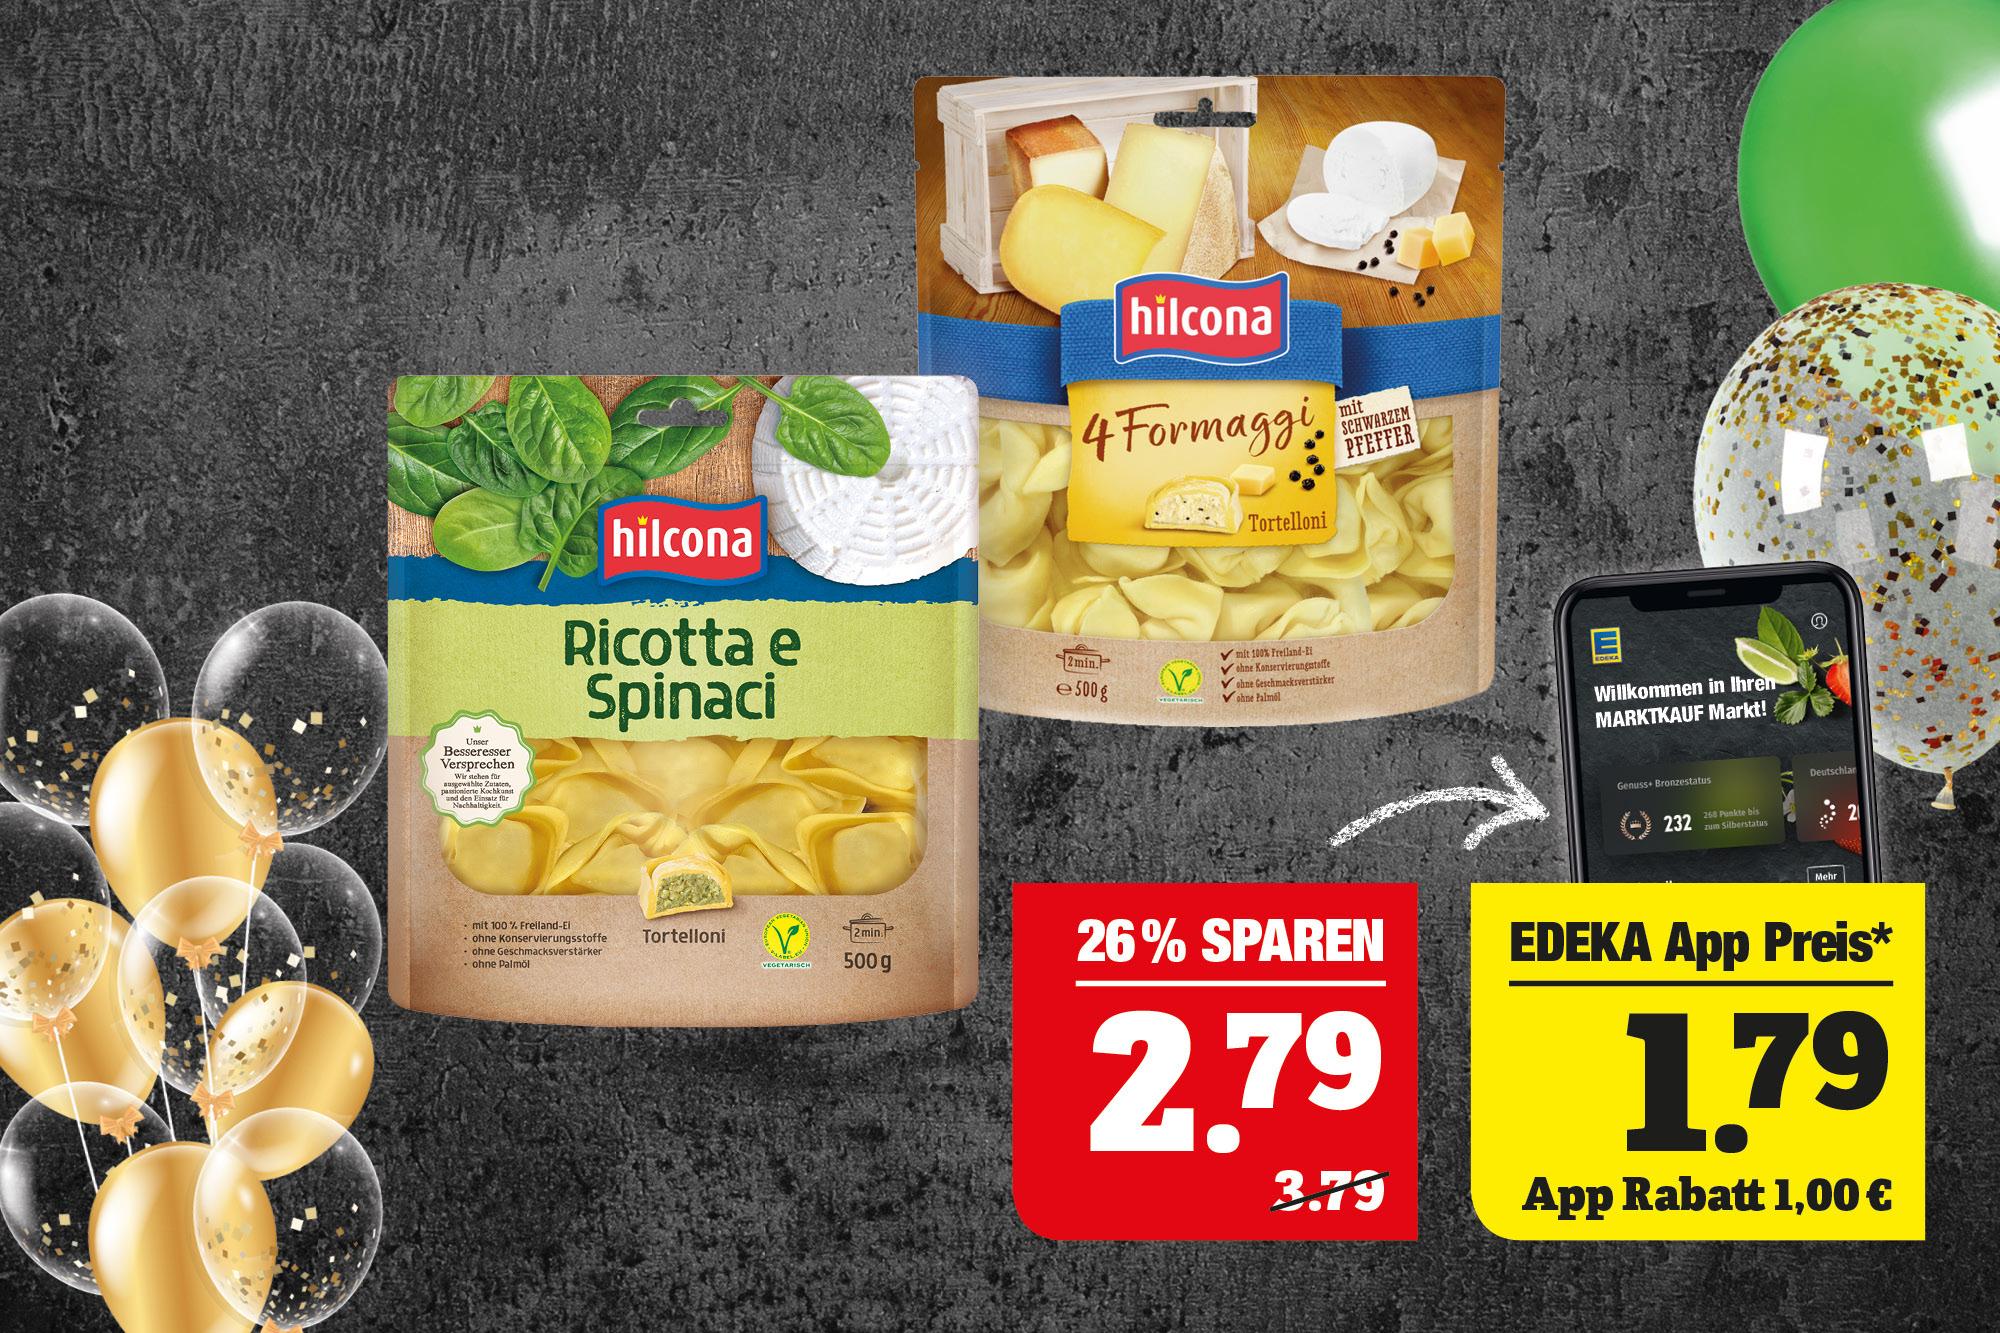 hilcona  Tortelloni - verschiedene Sorten; 500g Packung; 1kg=5,58.